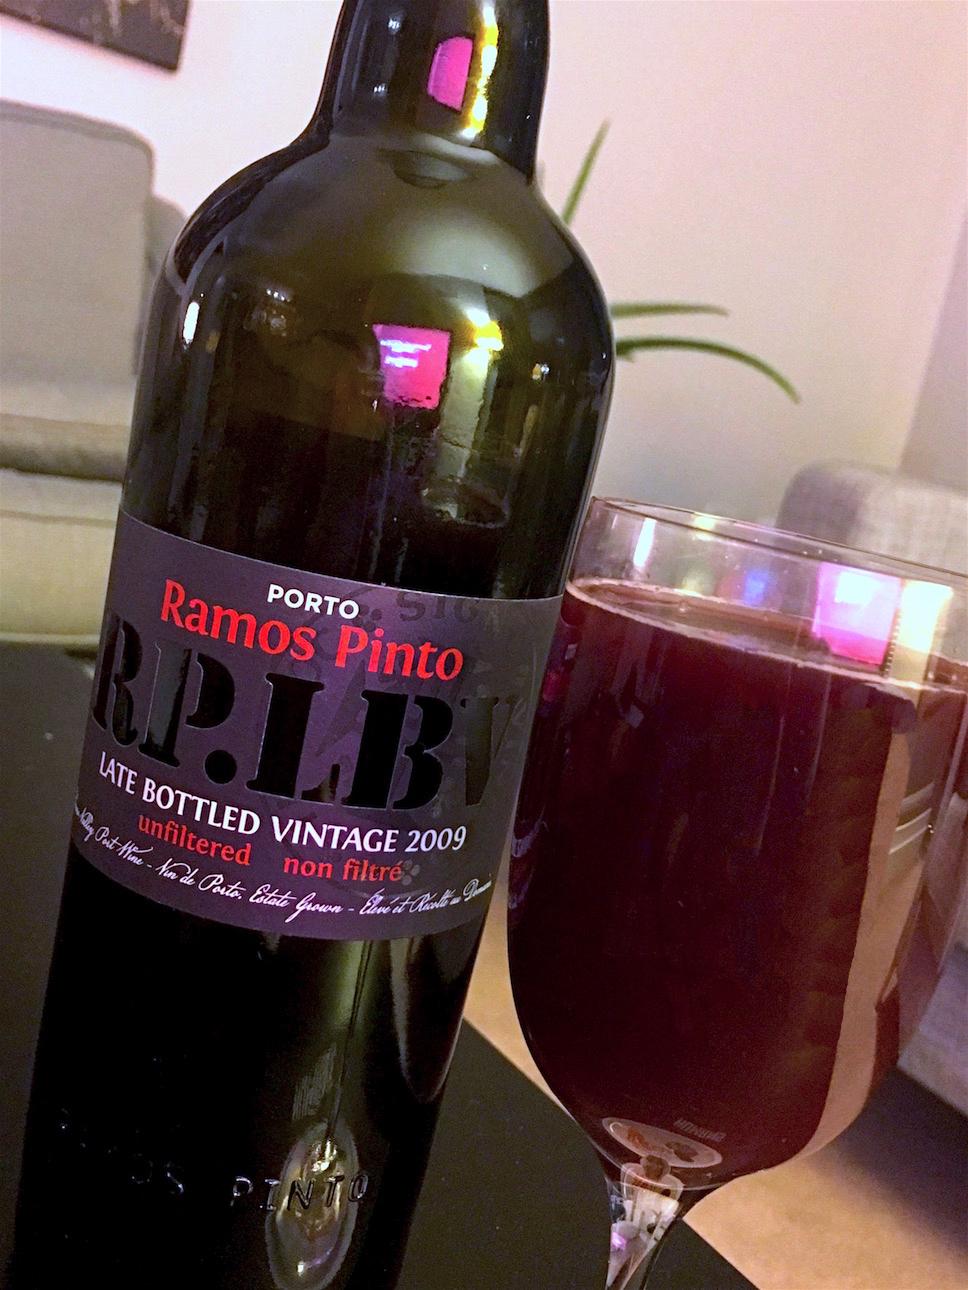 Ramos Pinto Port